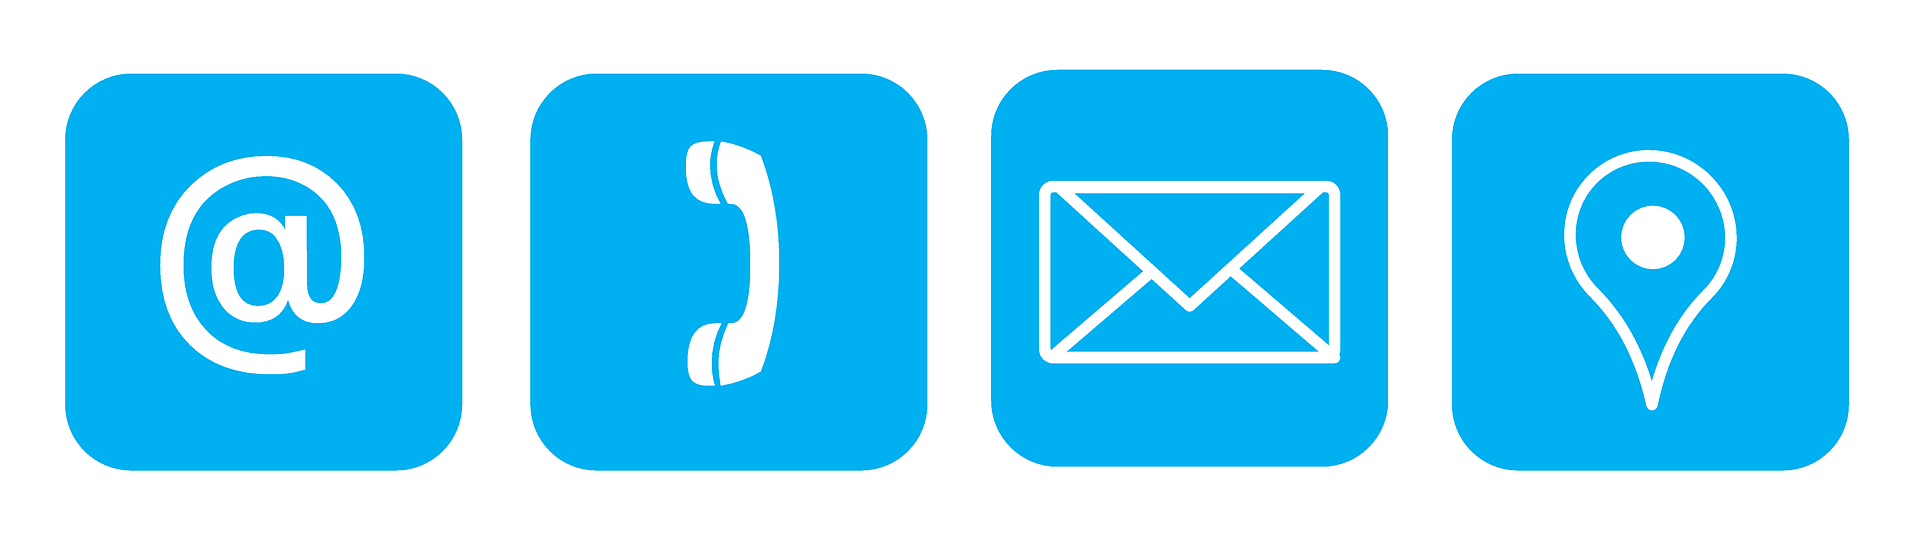 contact us \u2013 techno powerContact #21